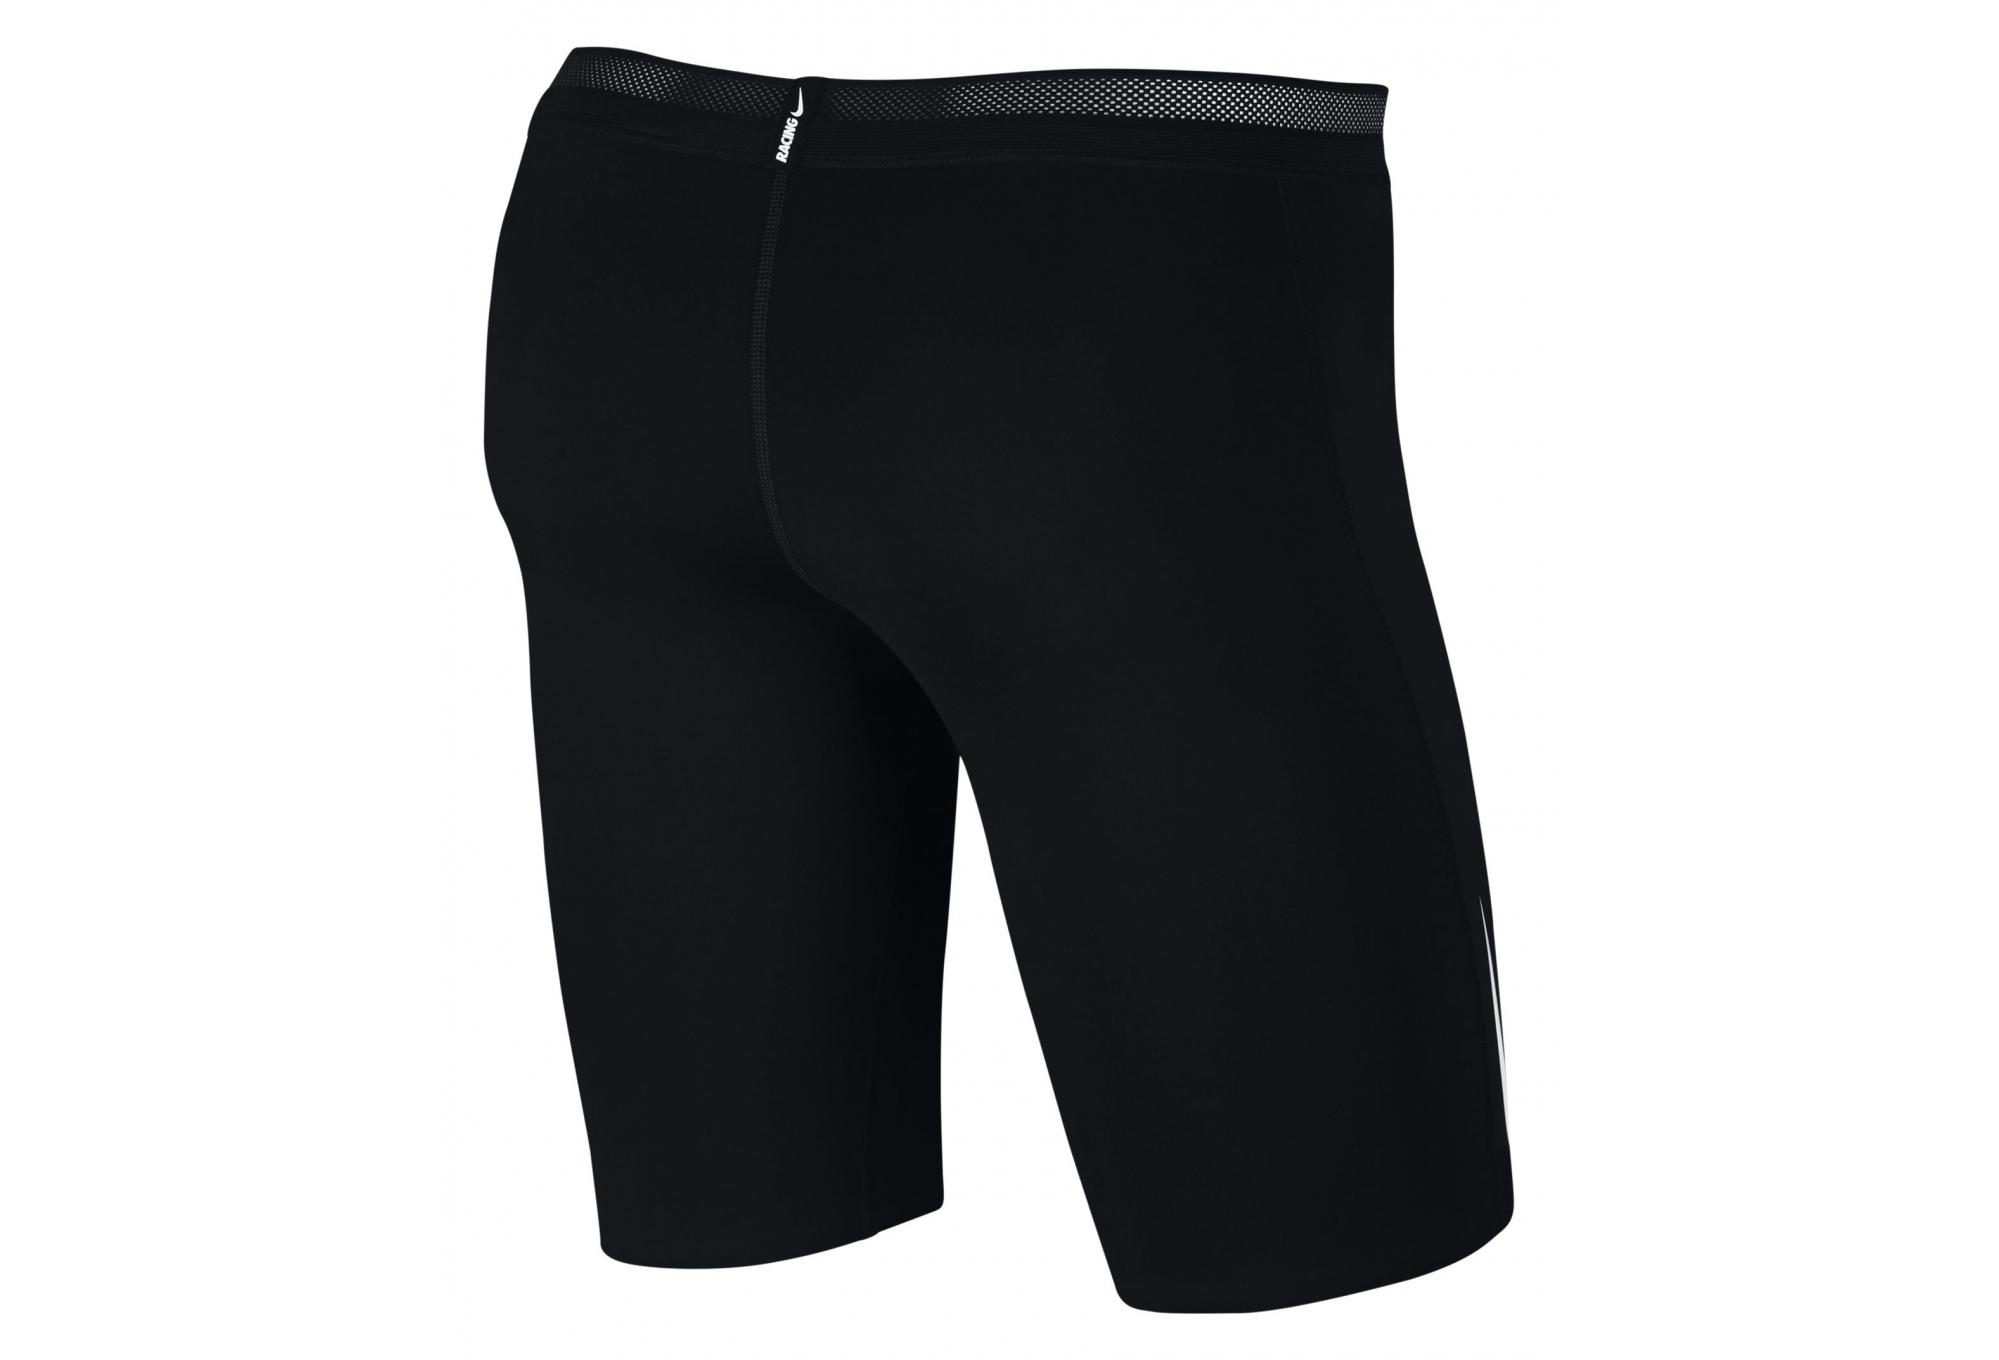 Nike Aeroswift Run Tight Black Men | Alltricks.com